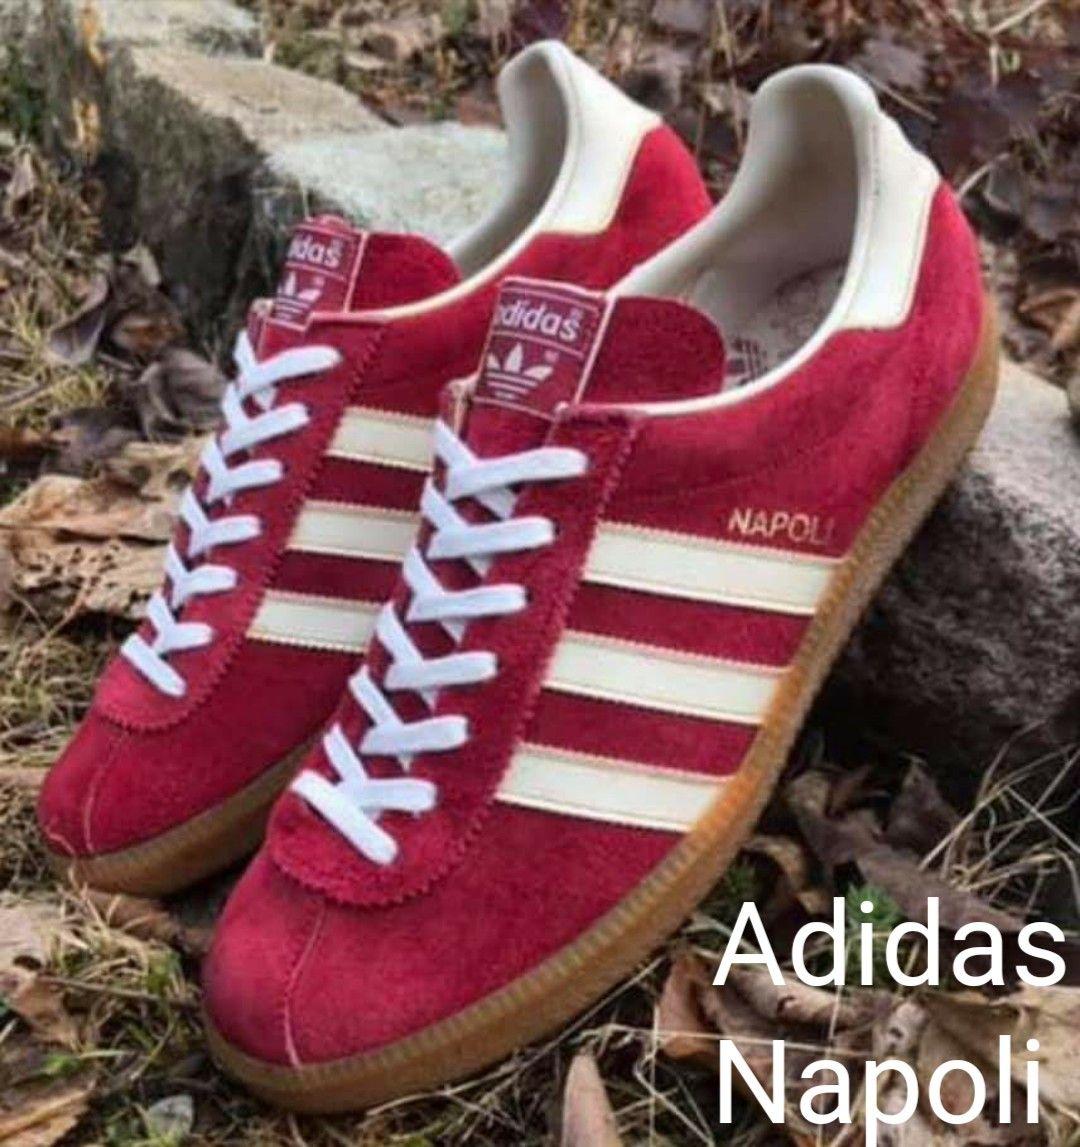 Crackin' pair of vintage Adidas Napoli cheers WT | Vintage